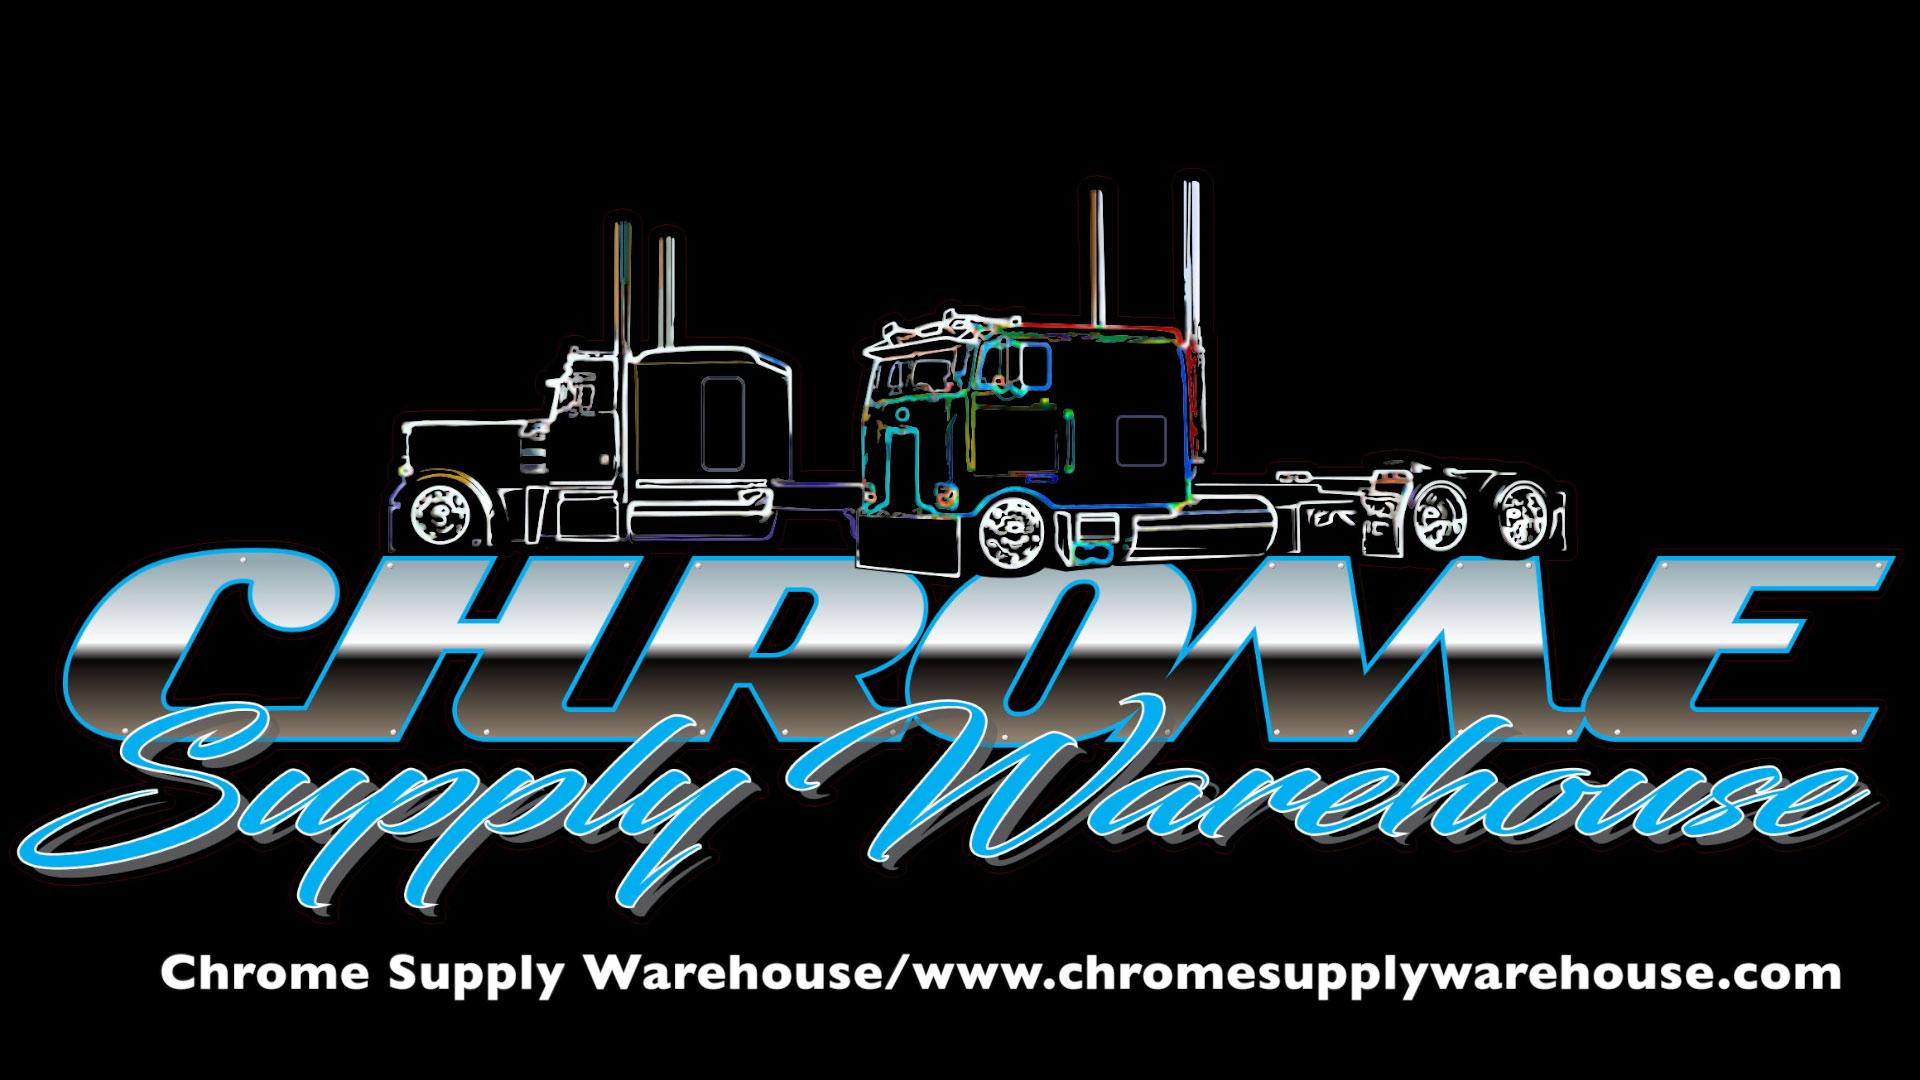 Chrome Supply Warehouse